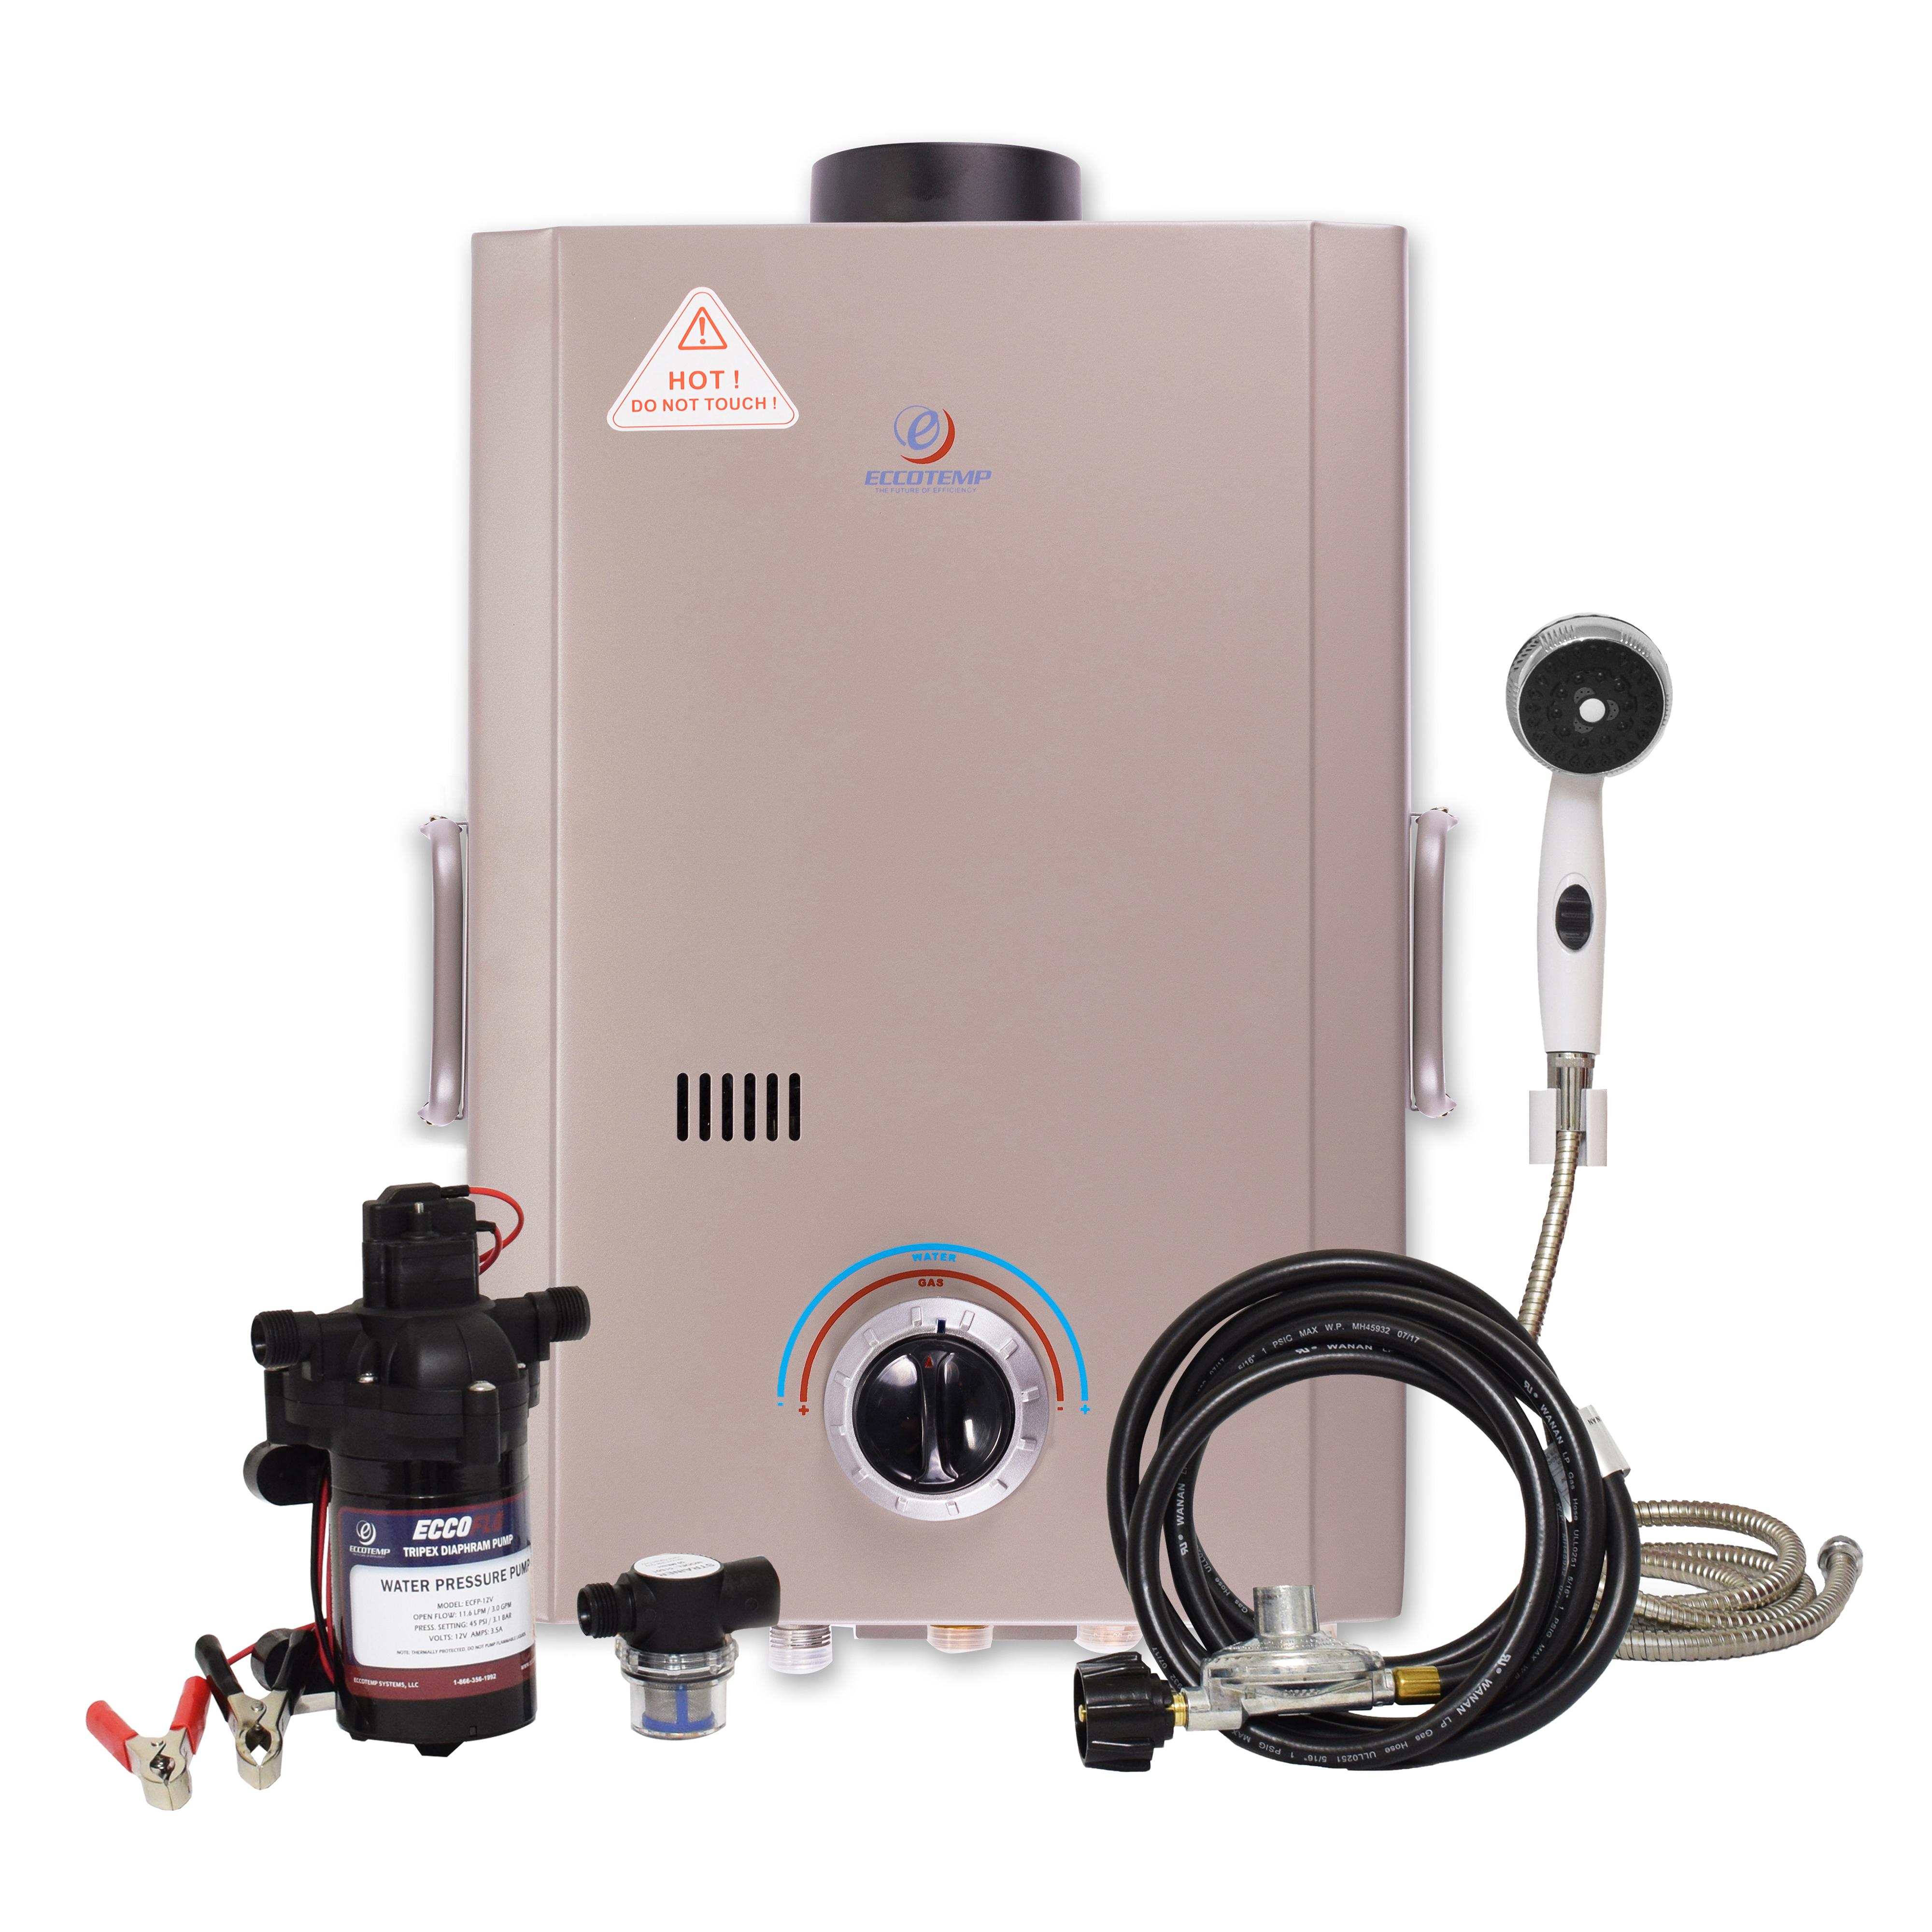 Eccotemp L7 Portable Outdoor Tankless Water Heater w/ EccoFlo Diaphragm 12V Pump & Strainer